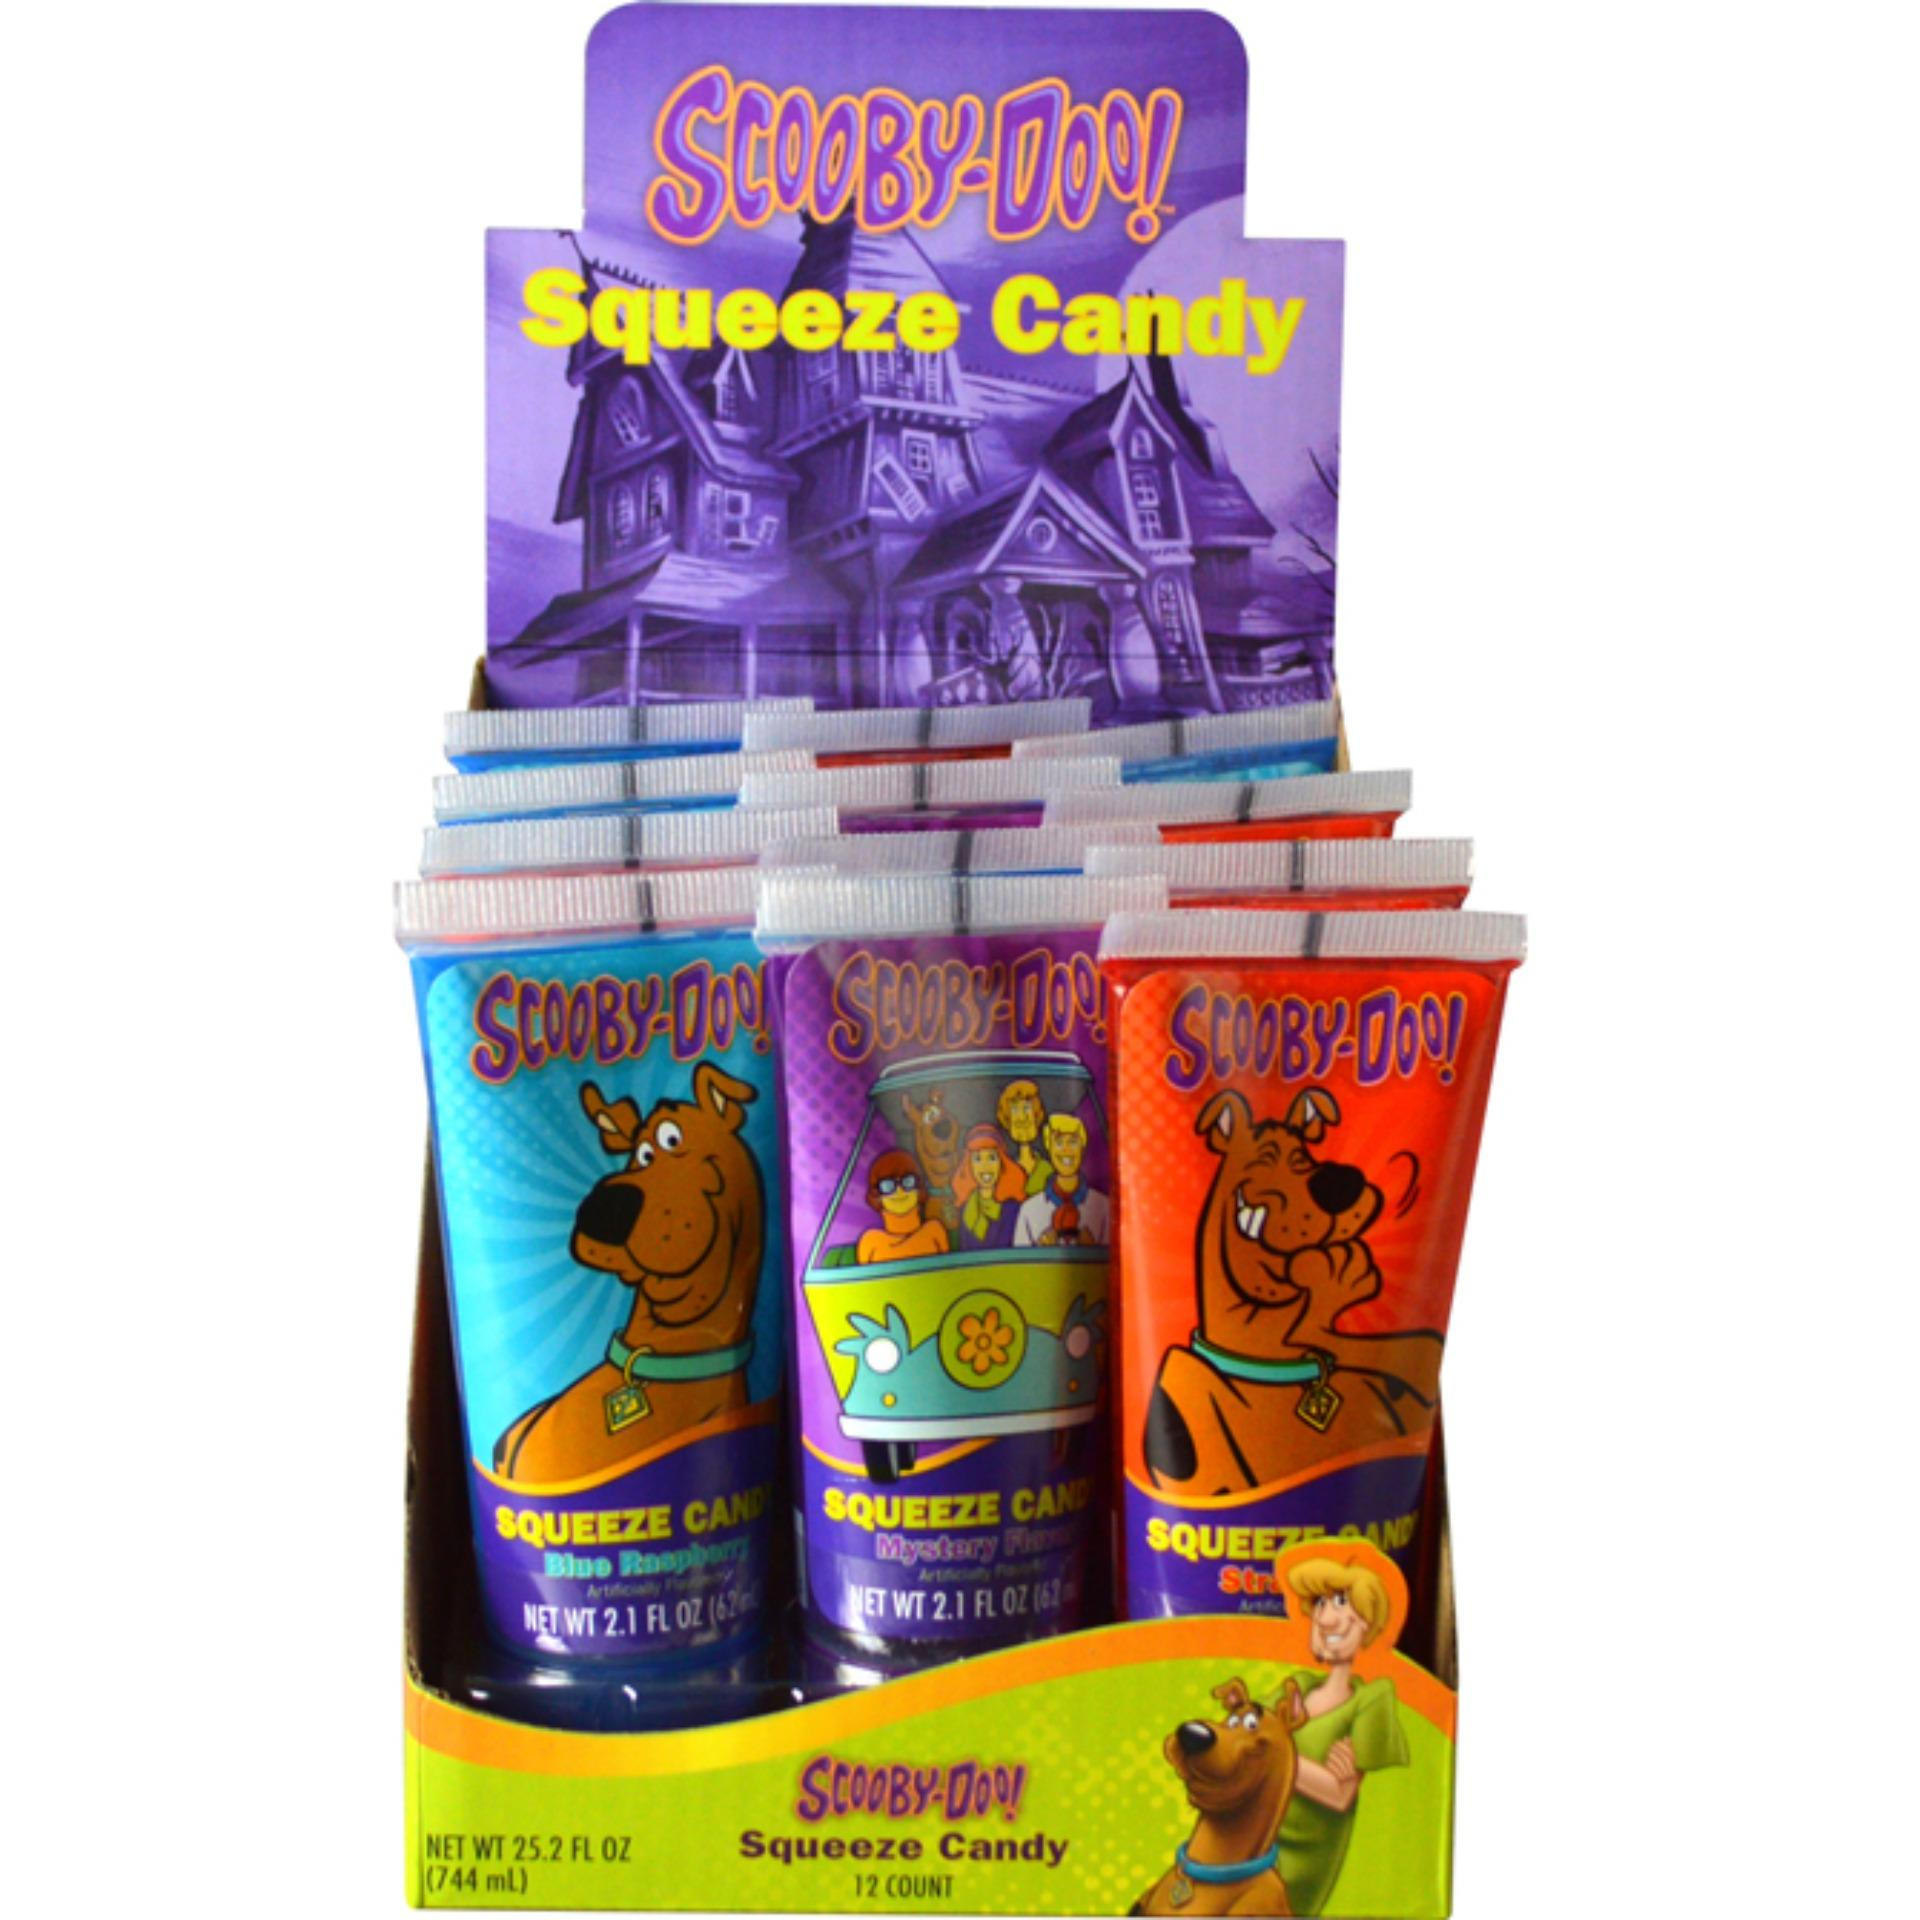 Kẹo tuýp kem đánh răng Scooby-Doo